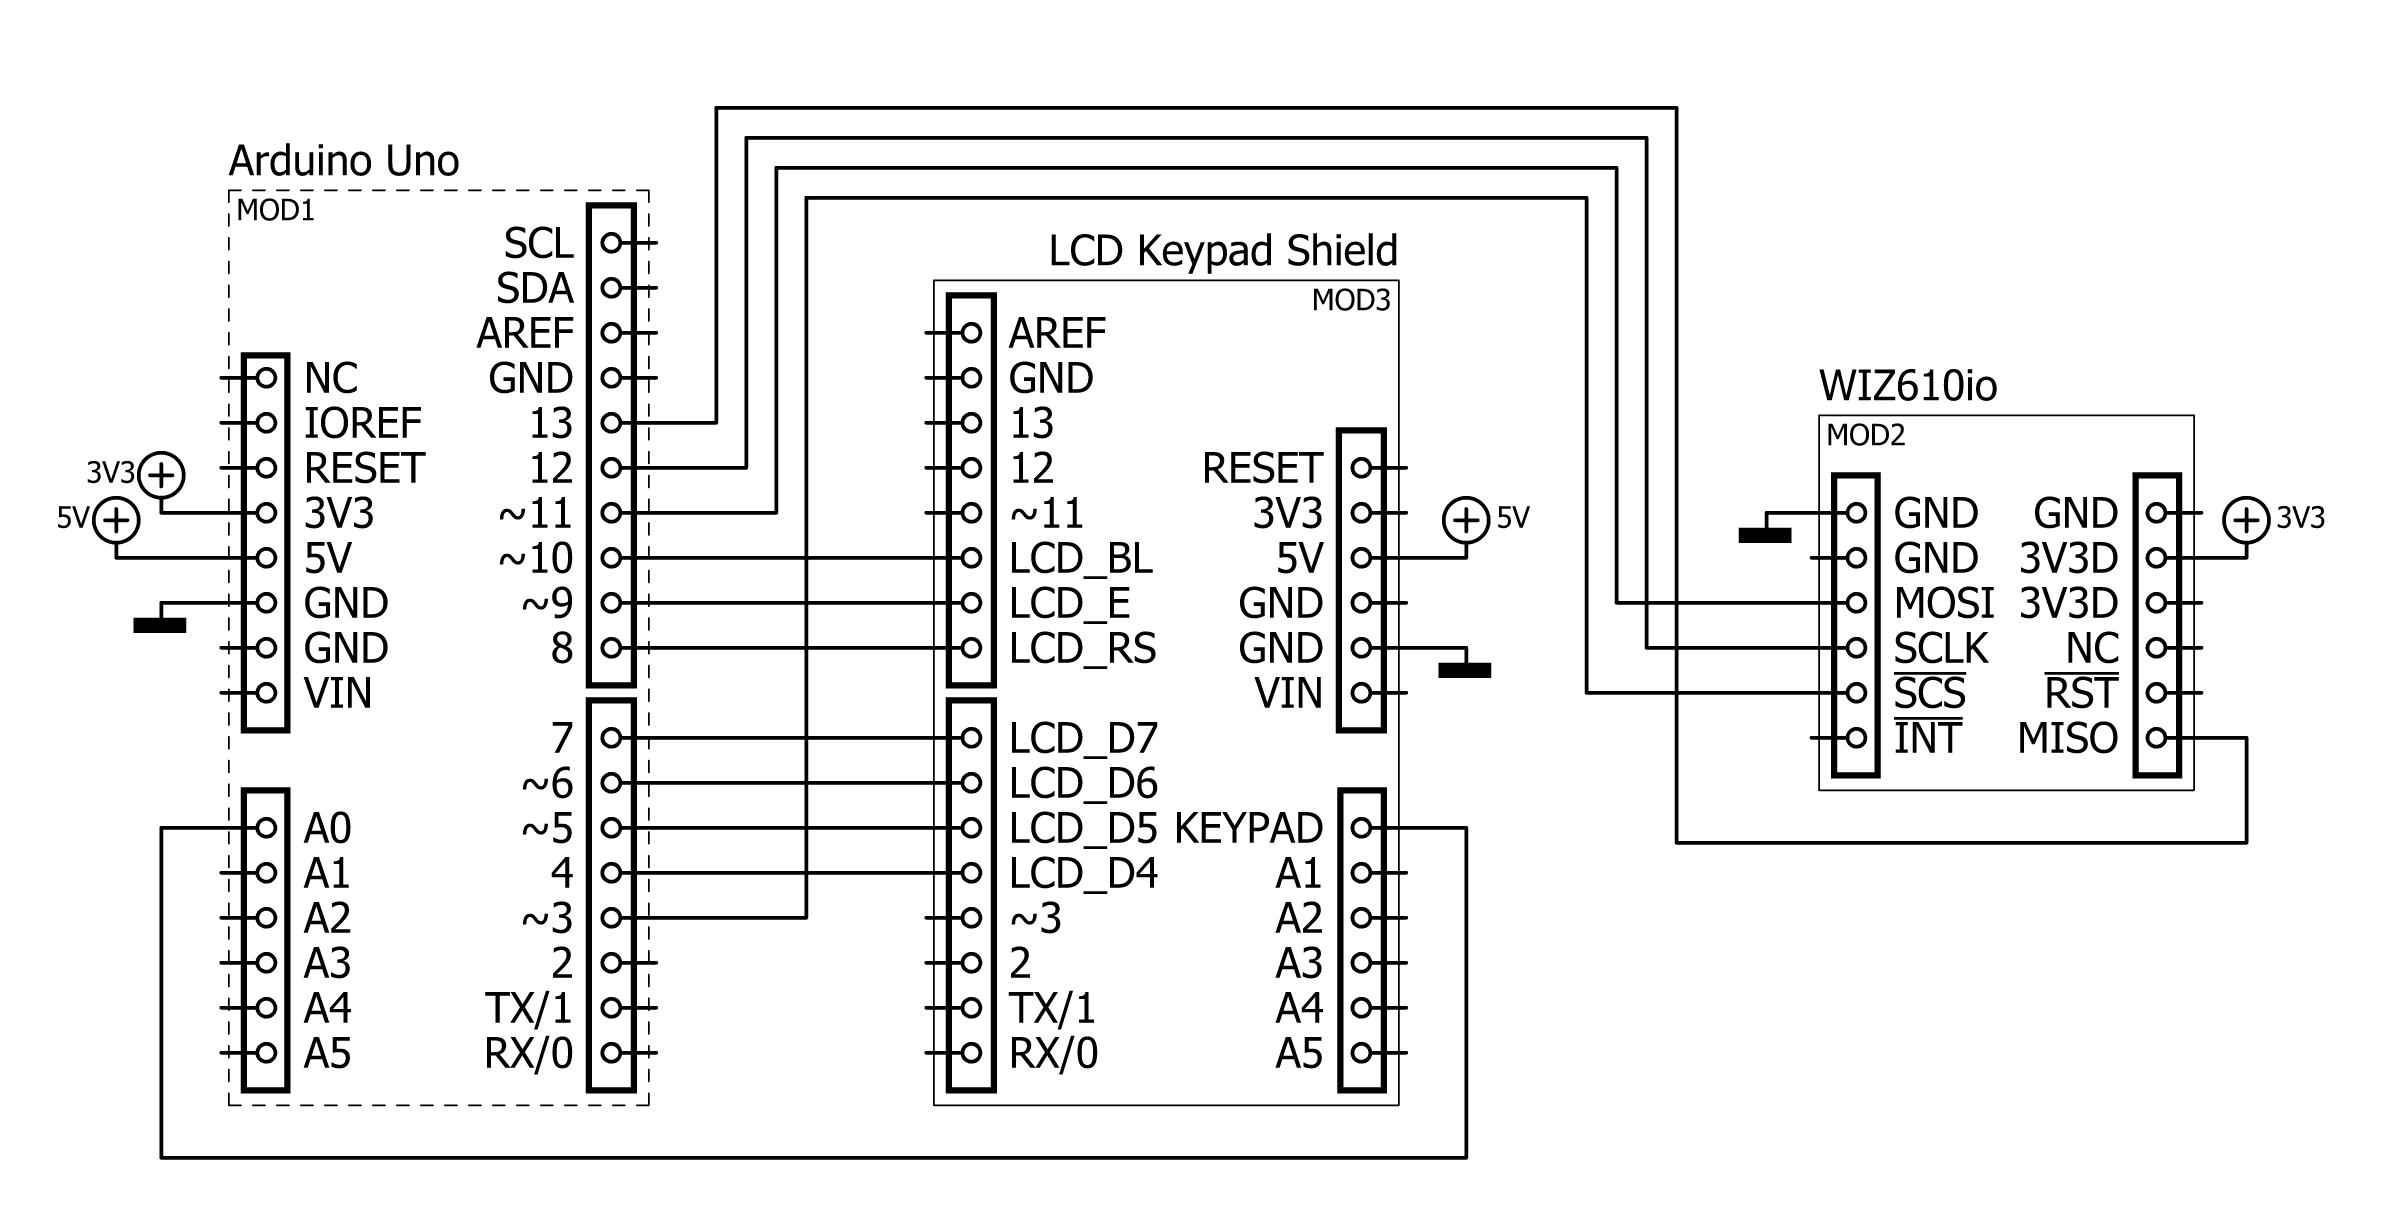 Uploads2ftmp2fa2b39e51 fc0b 4e60 a1e9 c5c380af5baa2fwiznet iot ioffload contest circuit clemens valens 300dpi ujnqpkmzsn